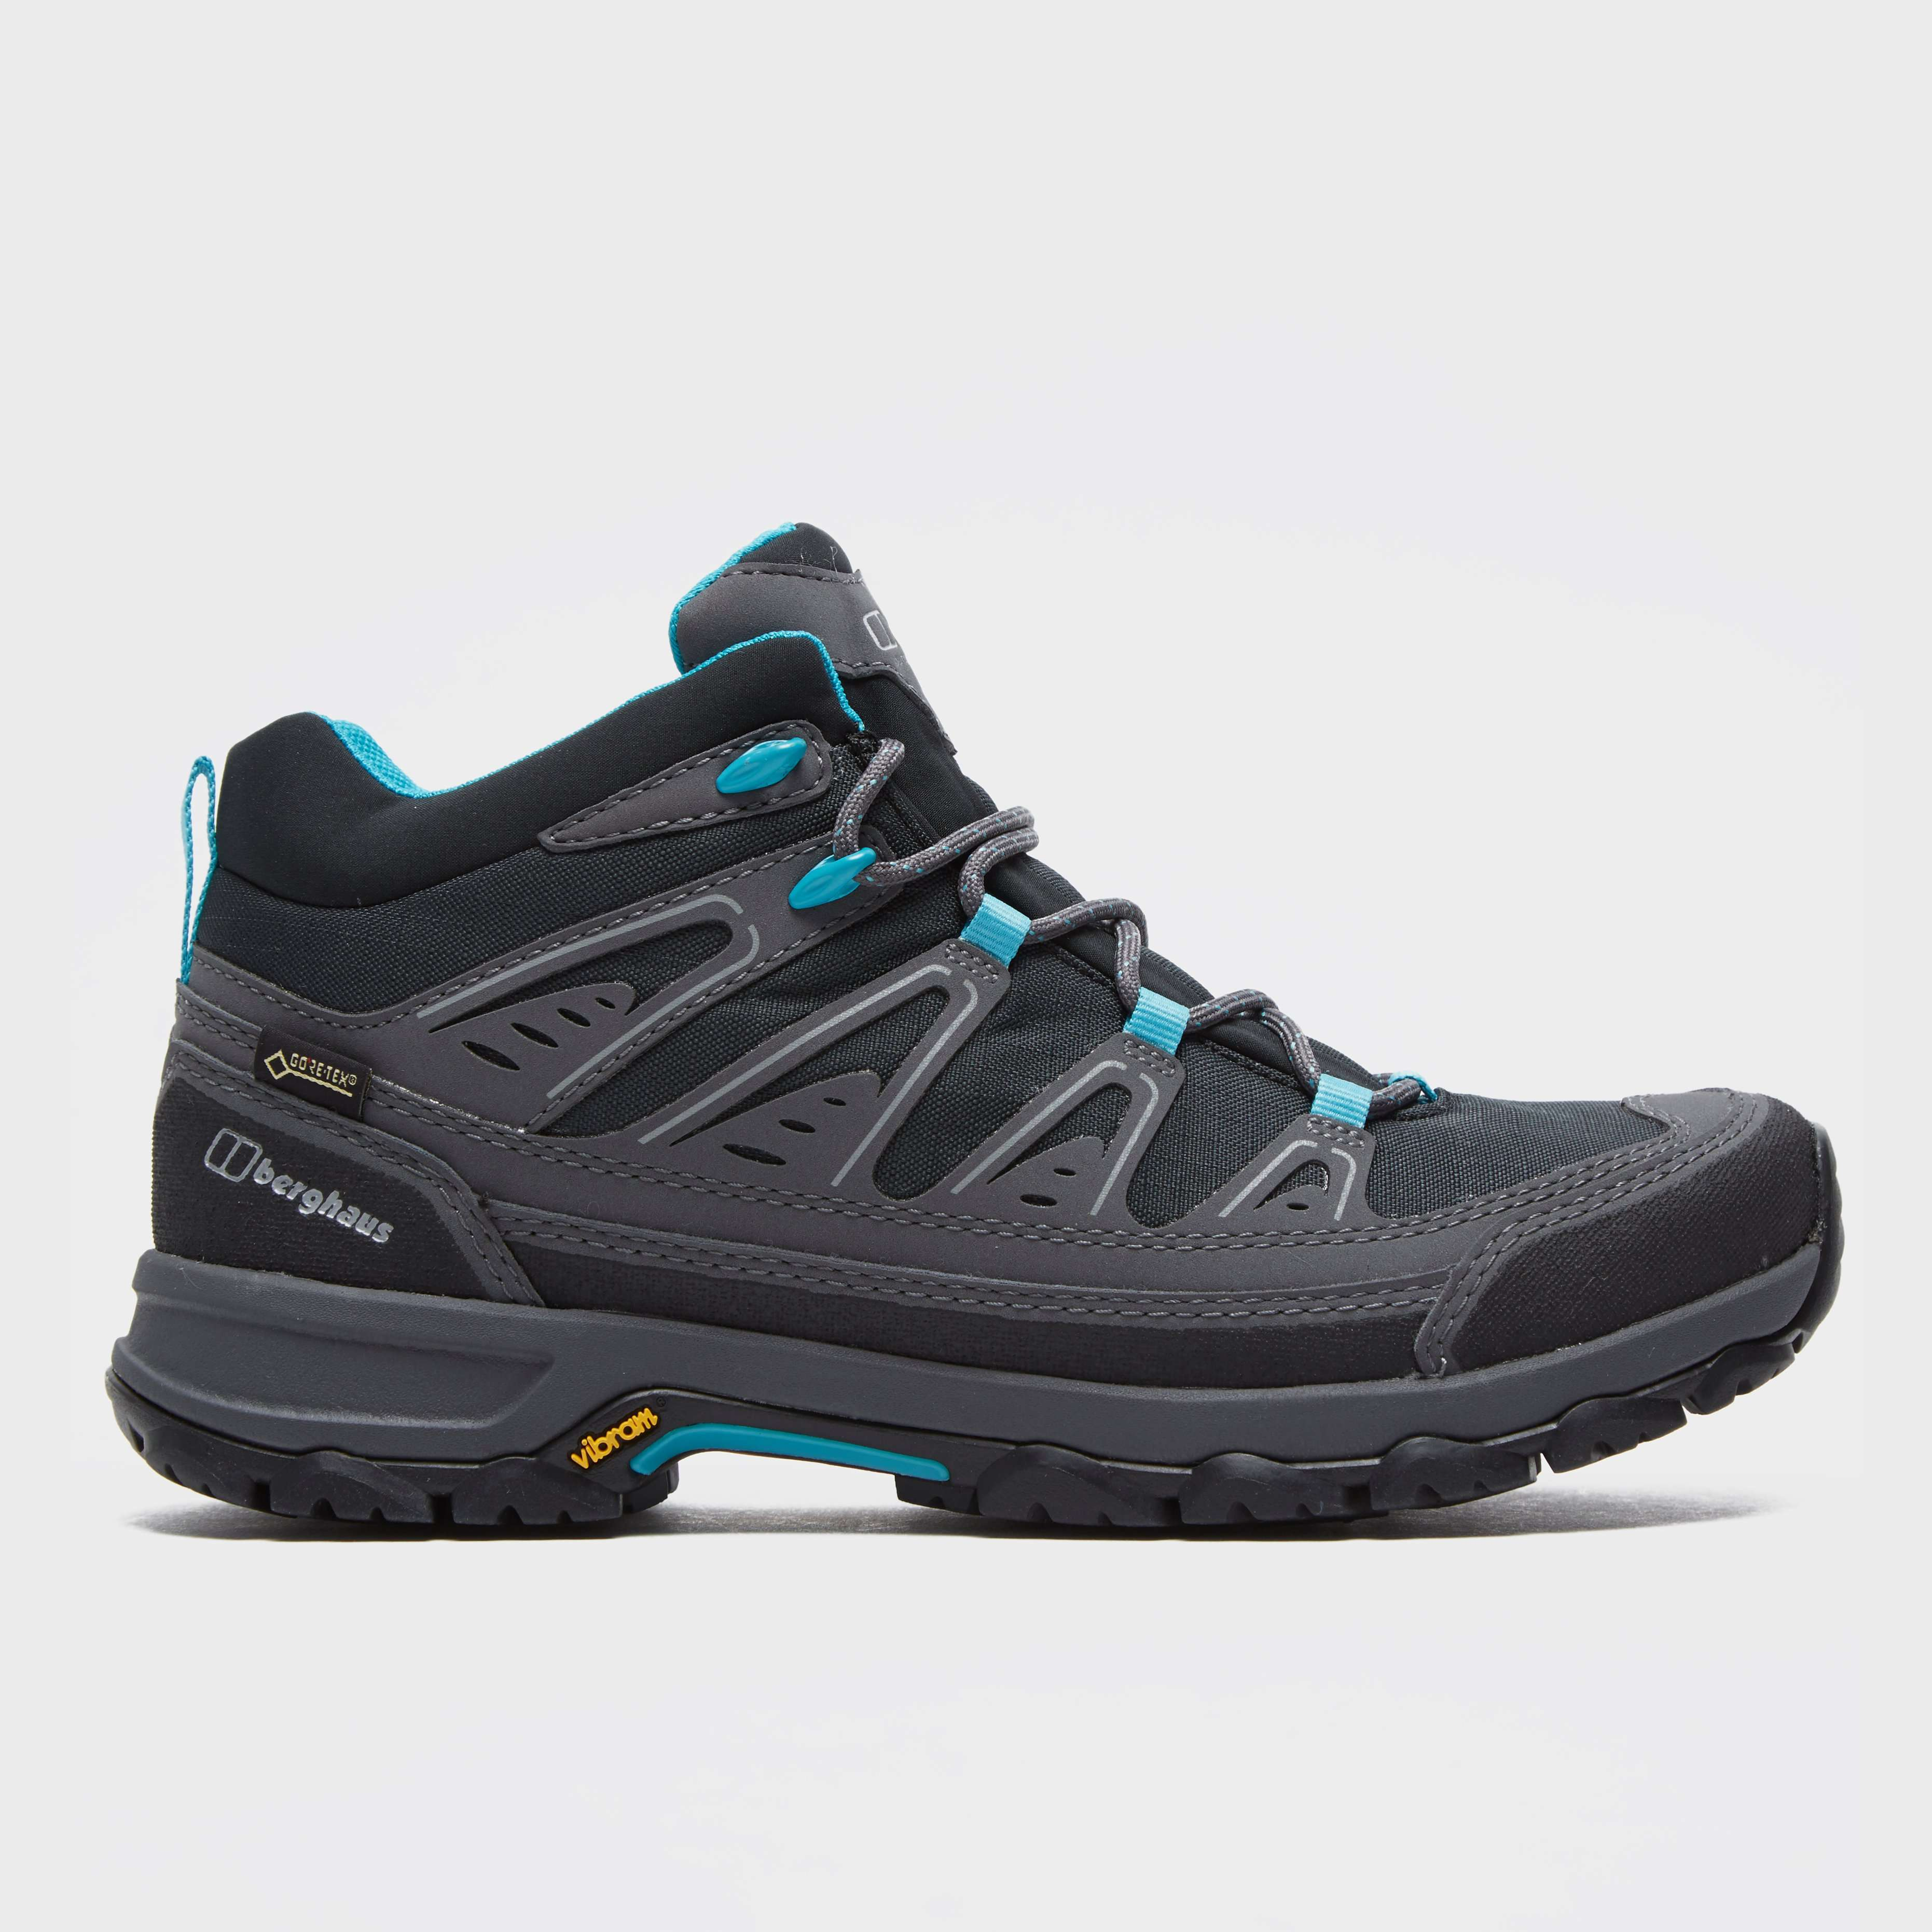 BERGHAUS Women's Explorer Active GORE-TEX® Boot